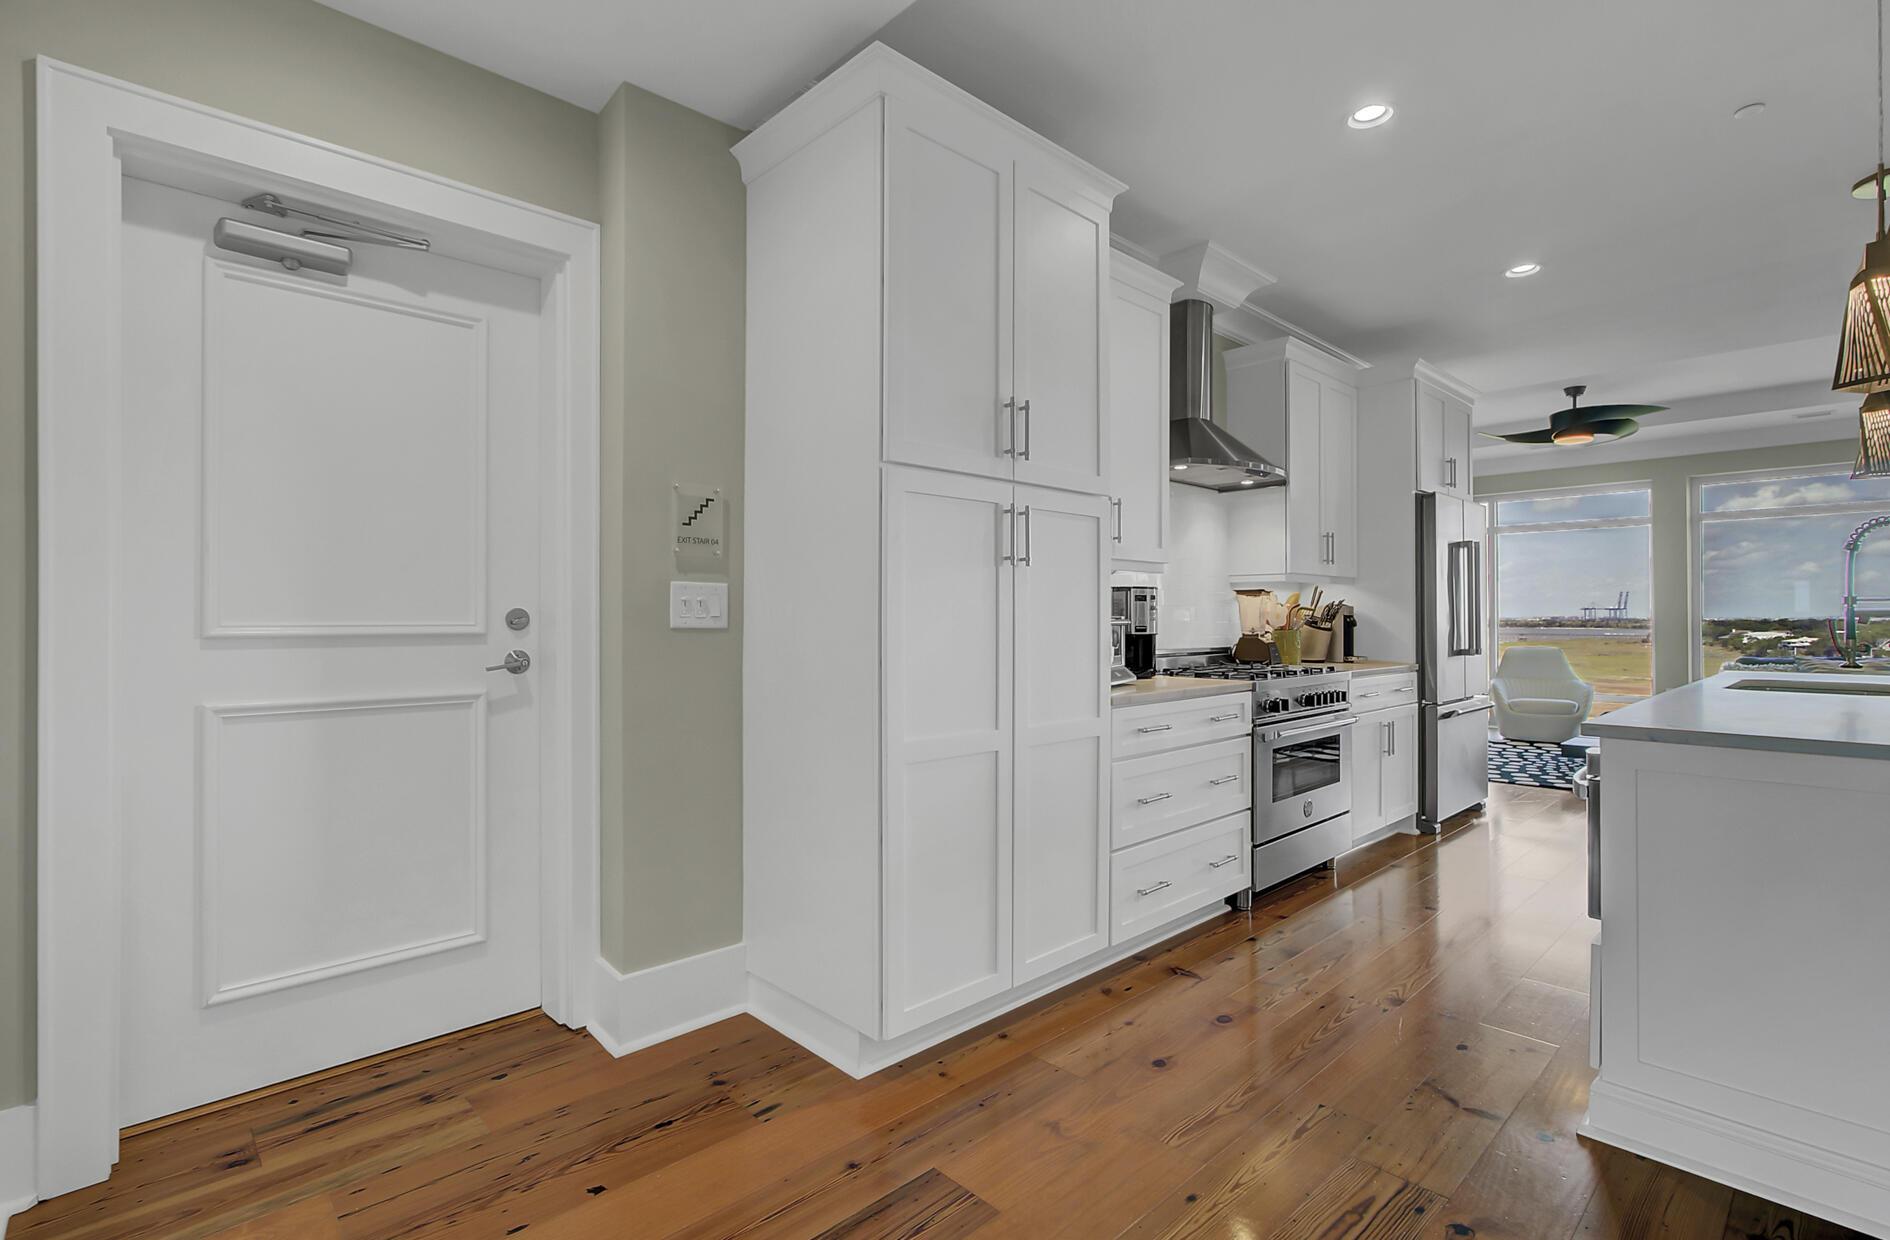 Tides IV Condominiums Homes For Sale - 155 Wingo Way, Mount Pleasant, SC - 24